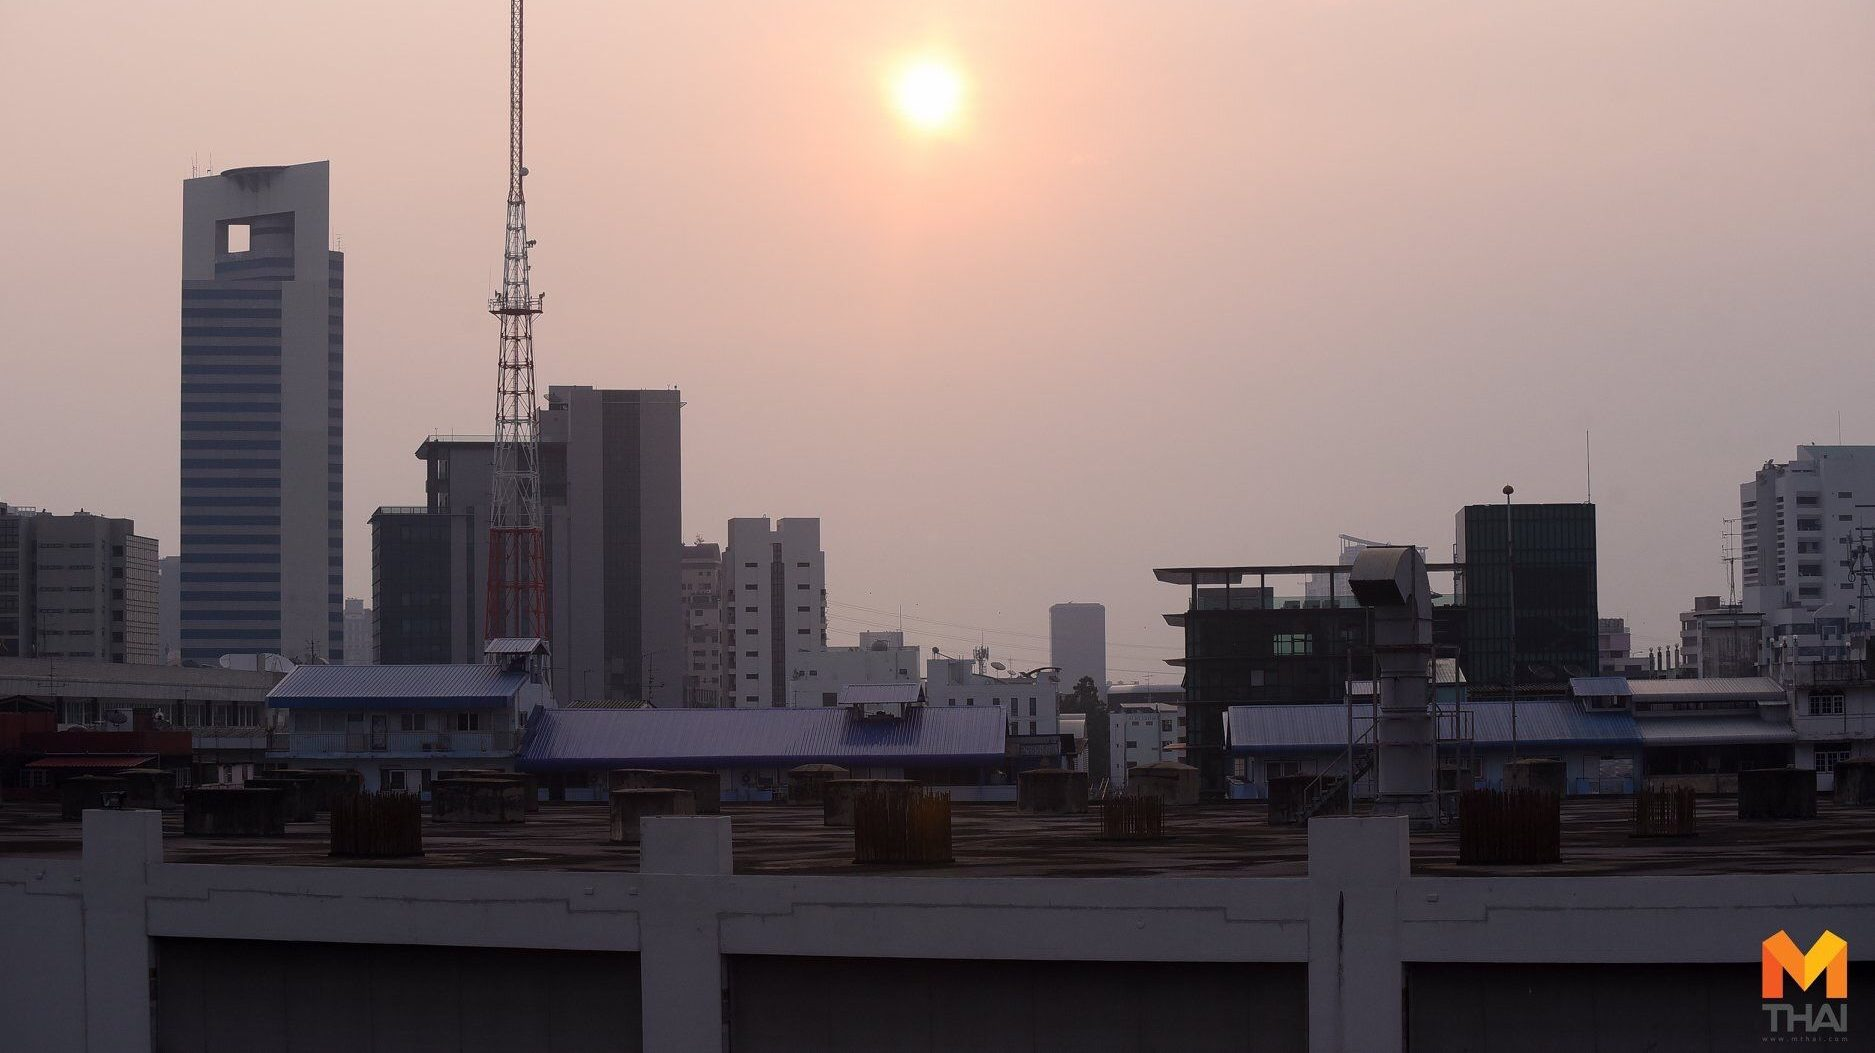 PM 2.5 ฝุ่น PM 2.5 ฝุ่นละออง